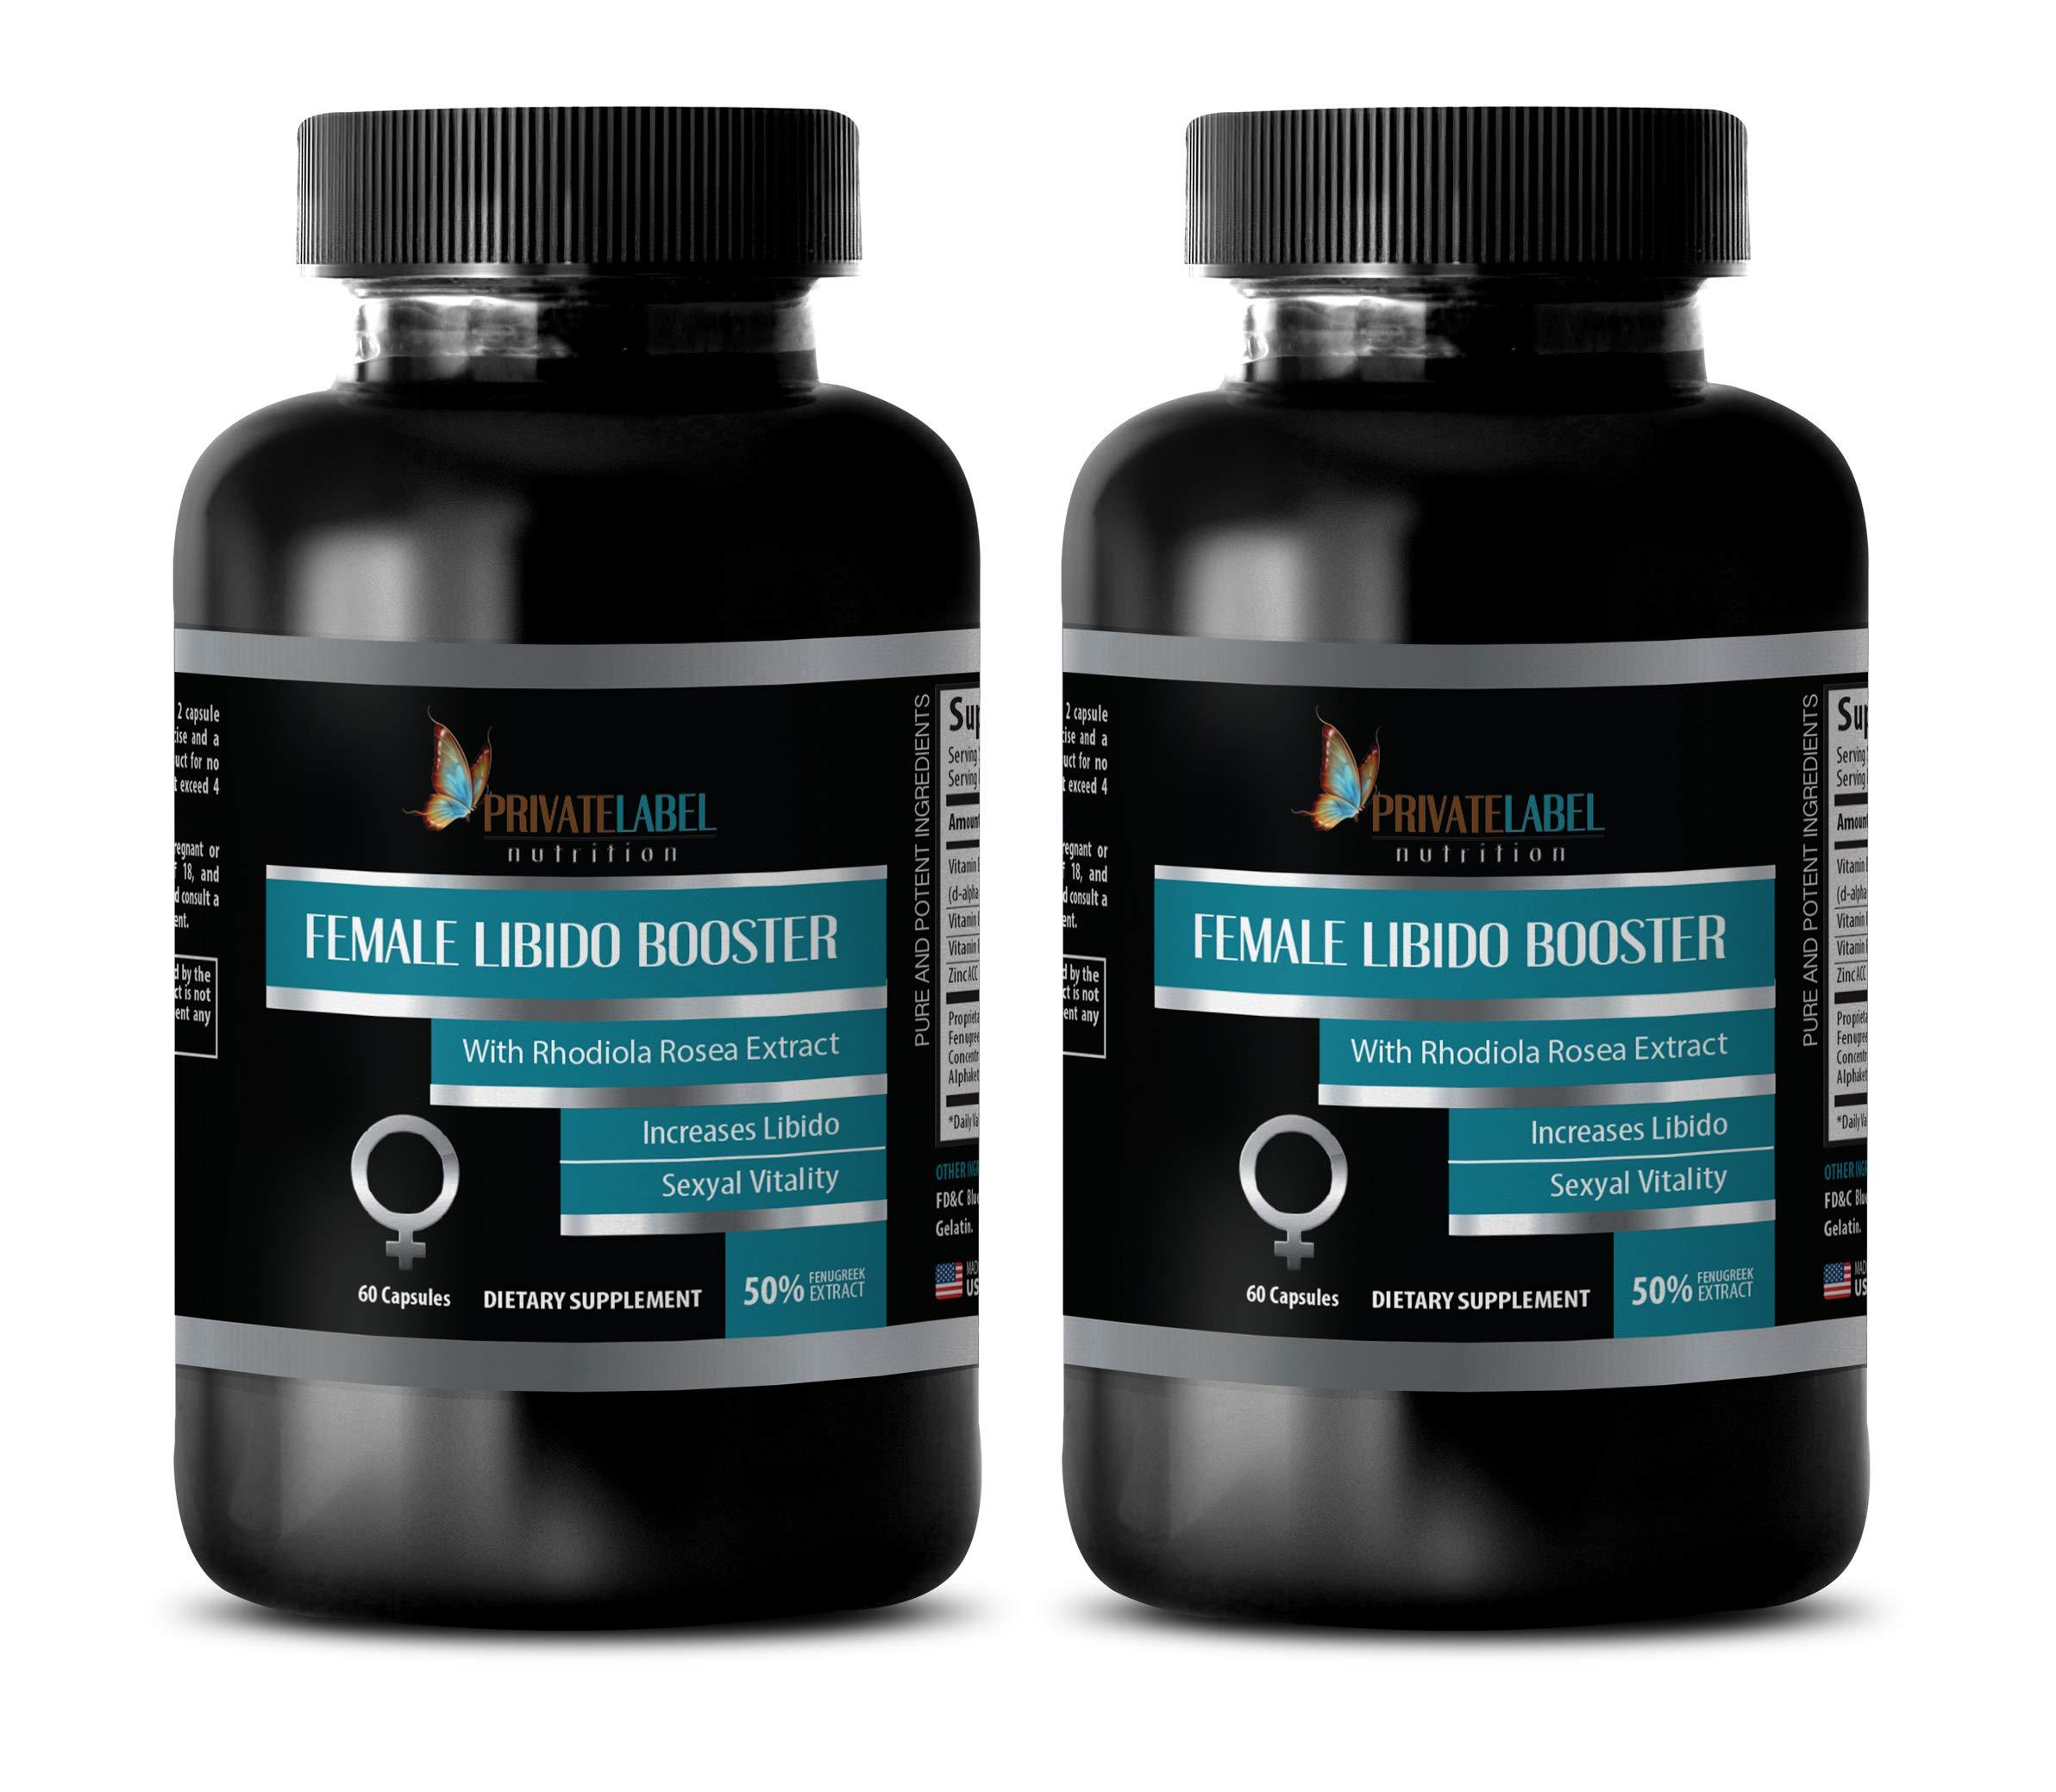 Boost libido Enhancer Women - Female LIBIDO Booster - Sexual Vitality - eurycoma longifolia Women - 2 Bottles 120 Capsules